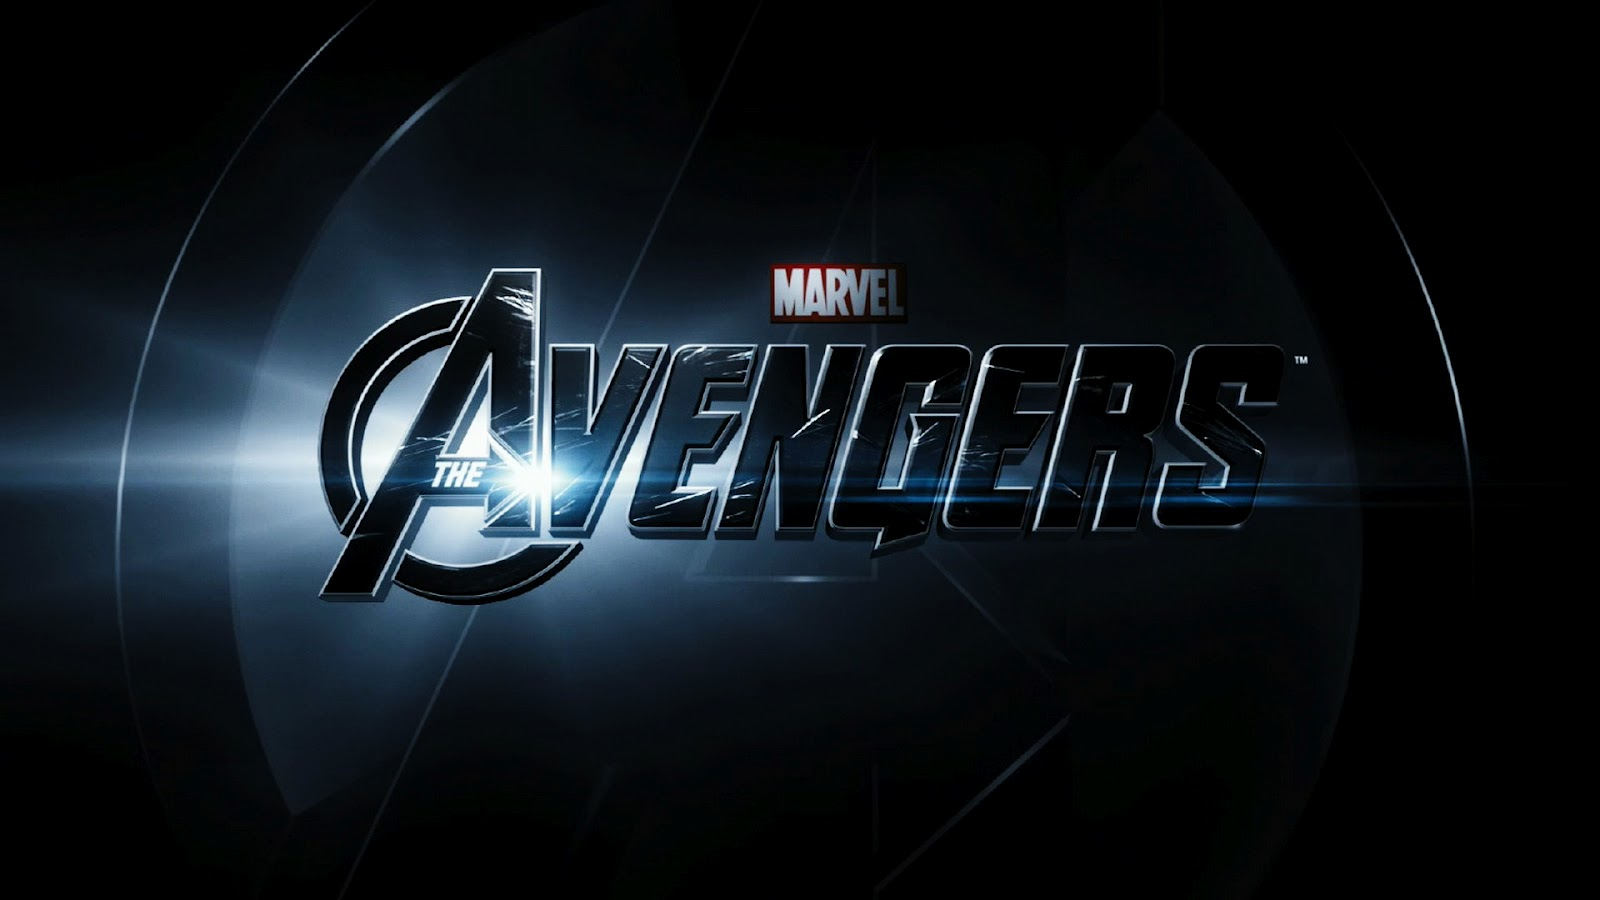 1920x1080 hd wallpaper avengers hd wallon - Avengers hd wallpapers free download ...